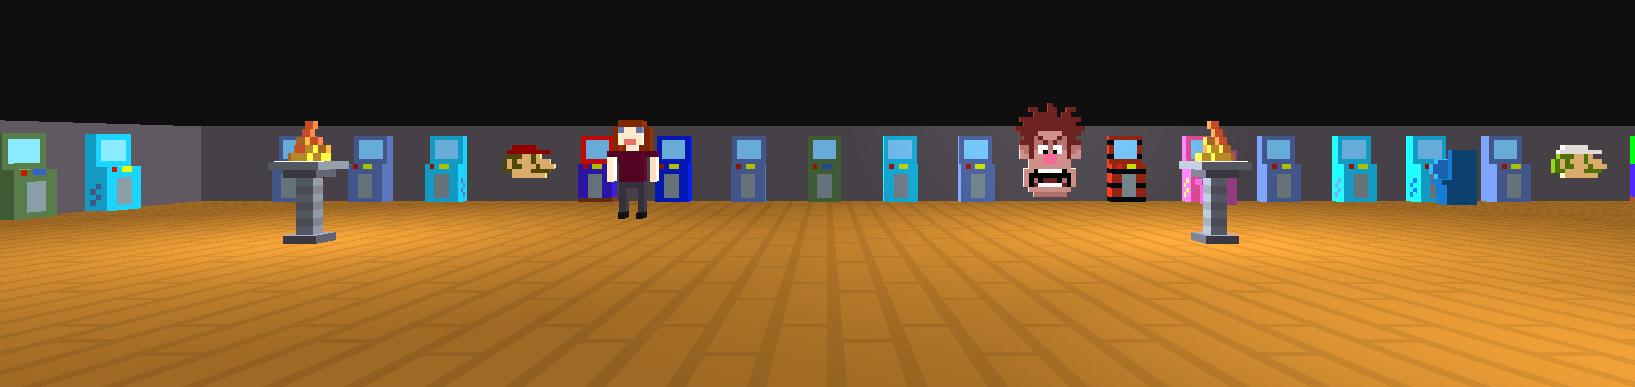 vloxelworld arcade